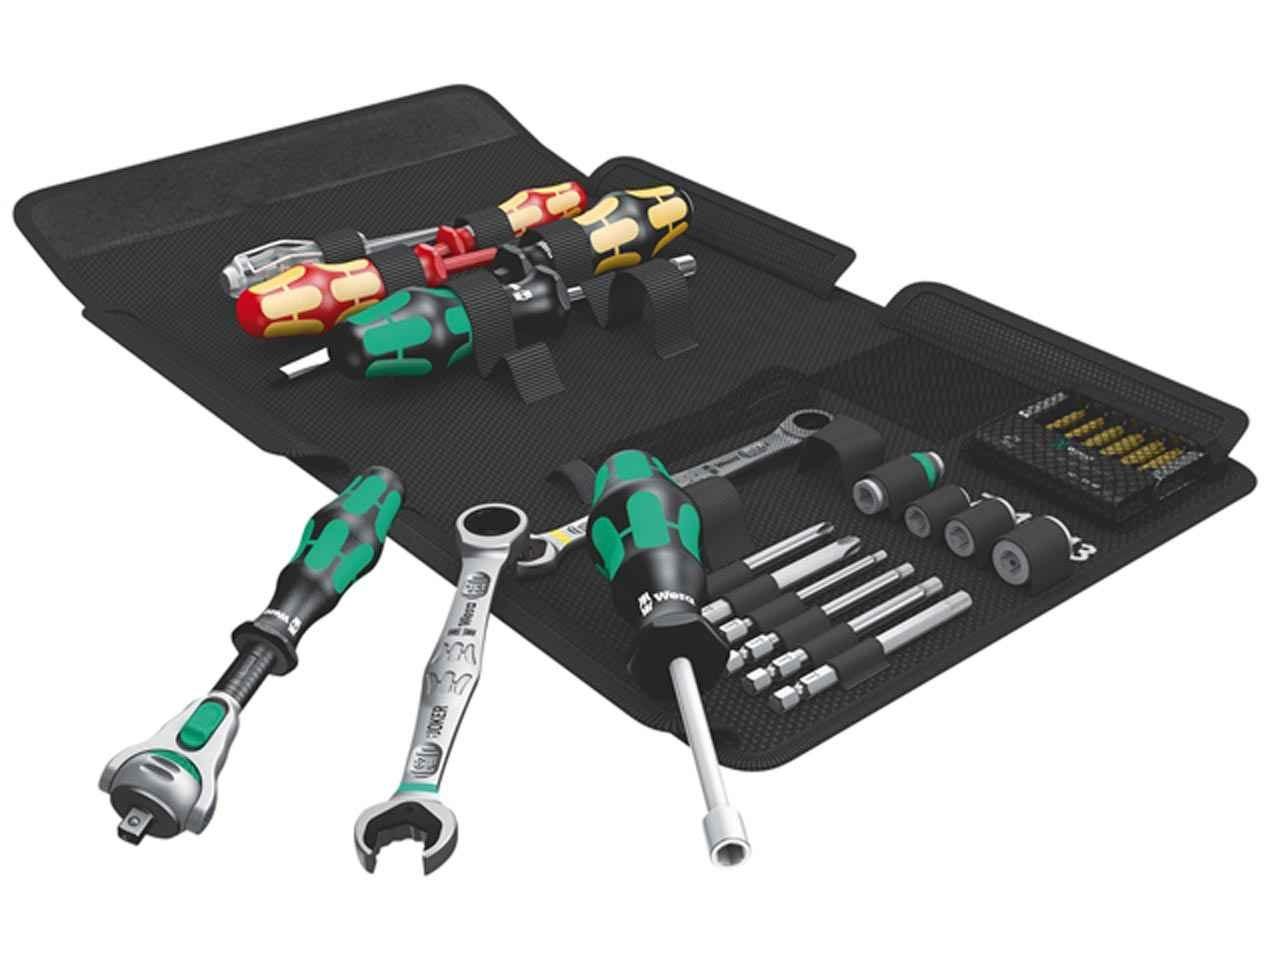 wera 05135927001 kraftform kompakt sh 1 mixed toolkit plumbkit. Black Bedroom Furniture Sets. Home Design Ideas